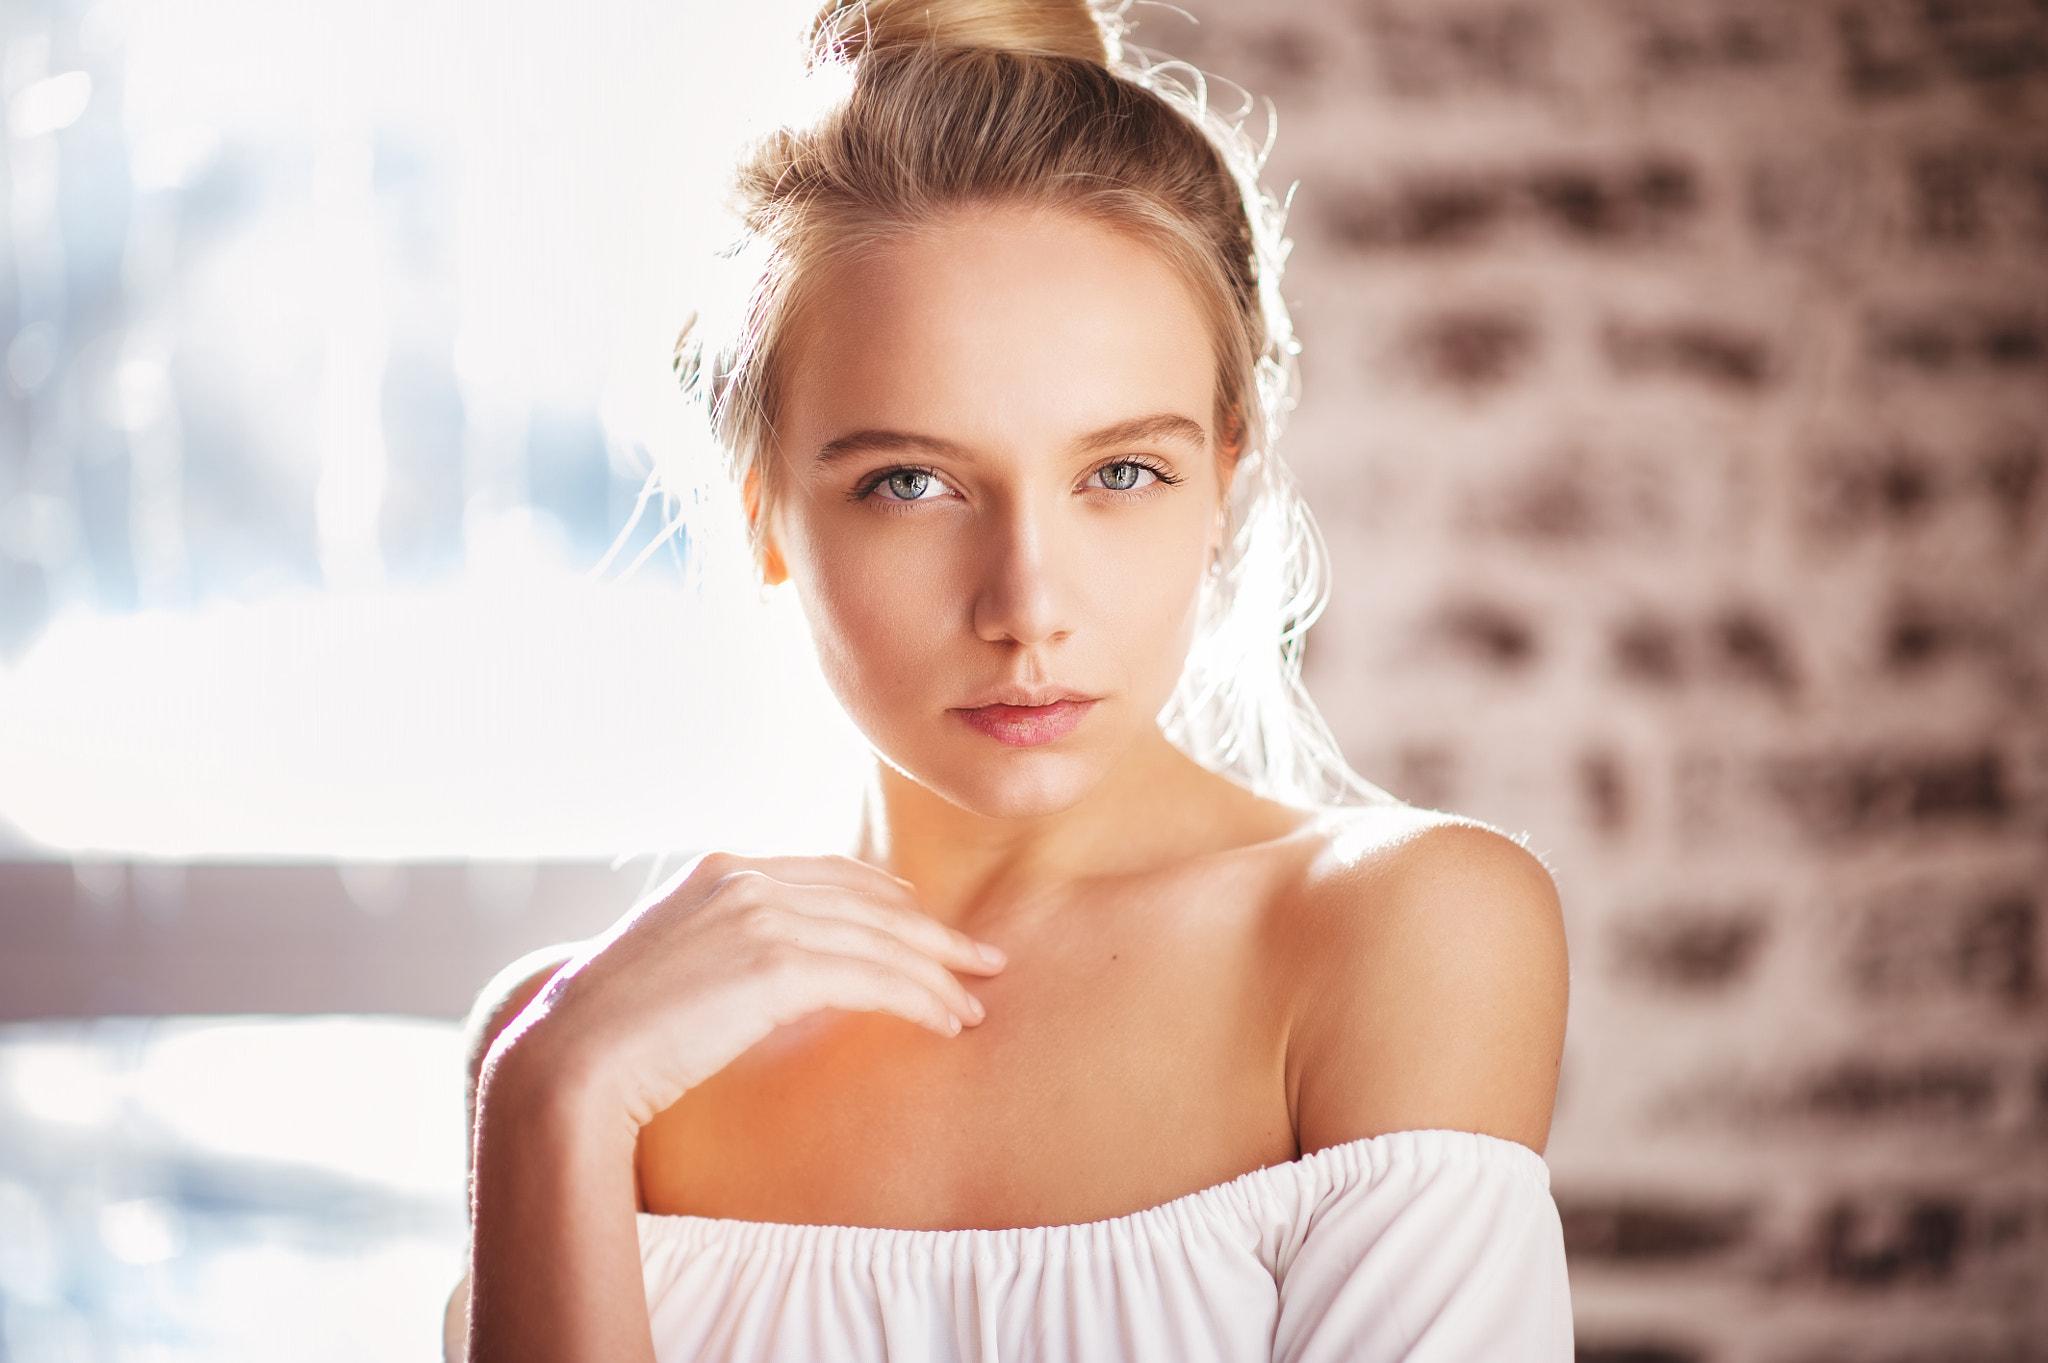 People 2048x1363 women Maria Popova Maxim Maximov bare shoulders portrait blonde hairbun women indoors